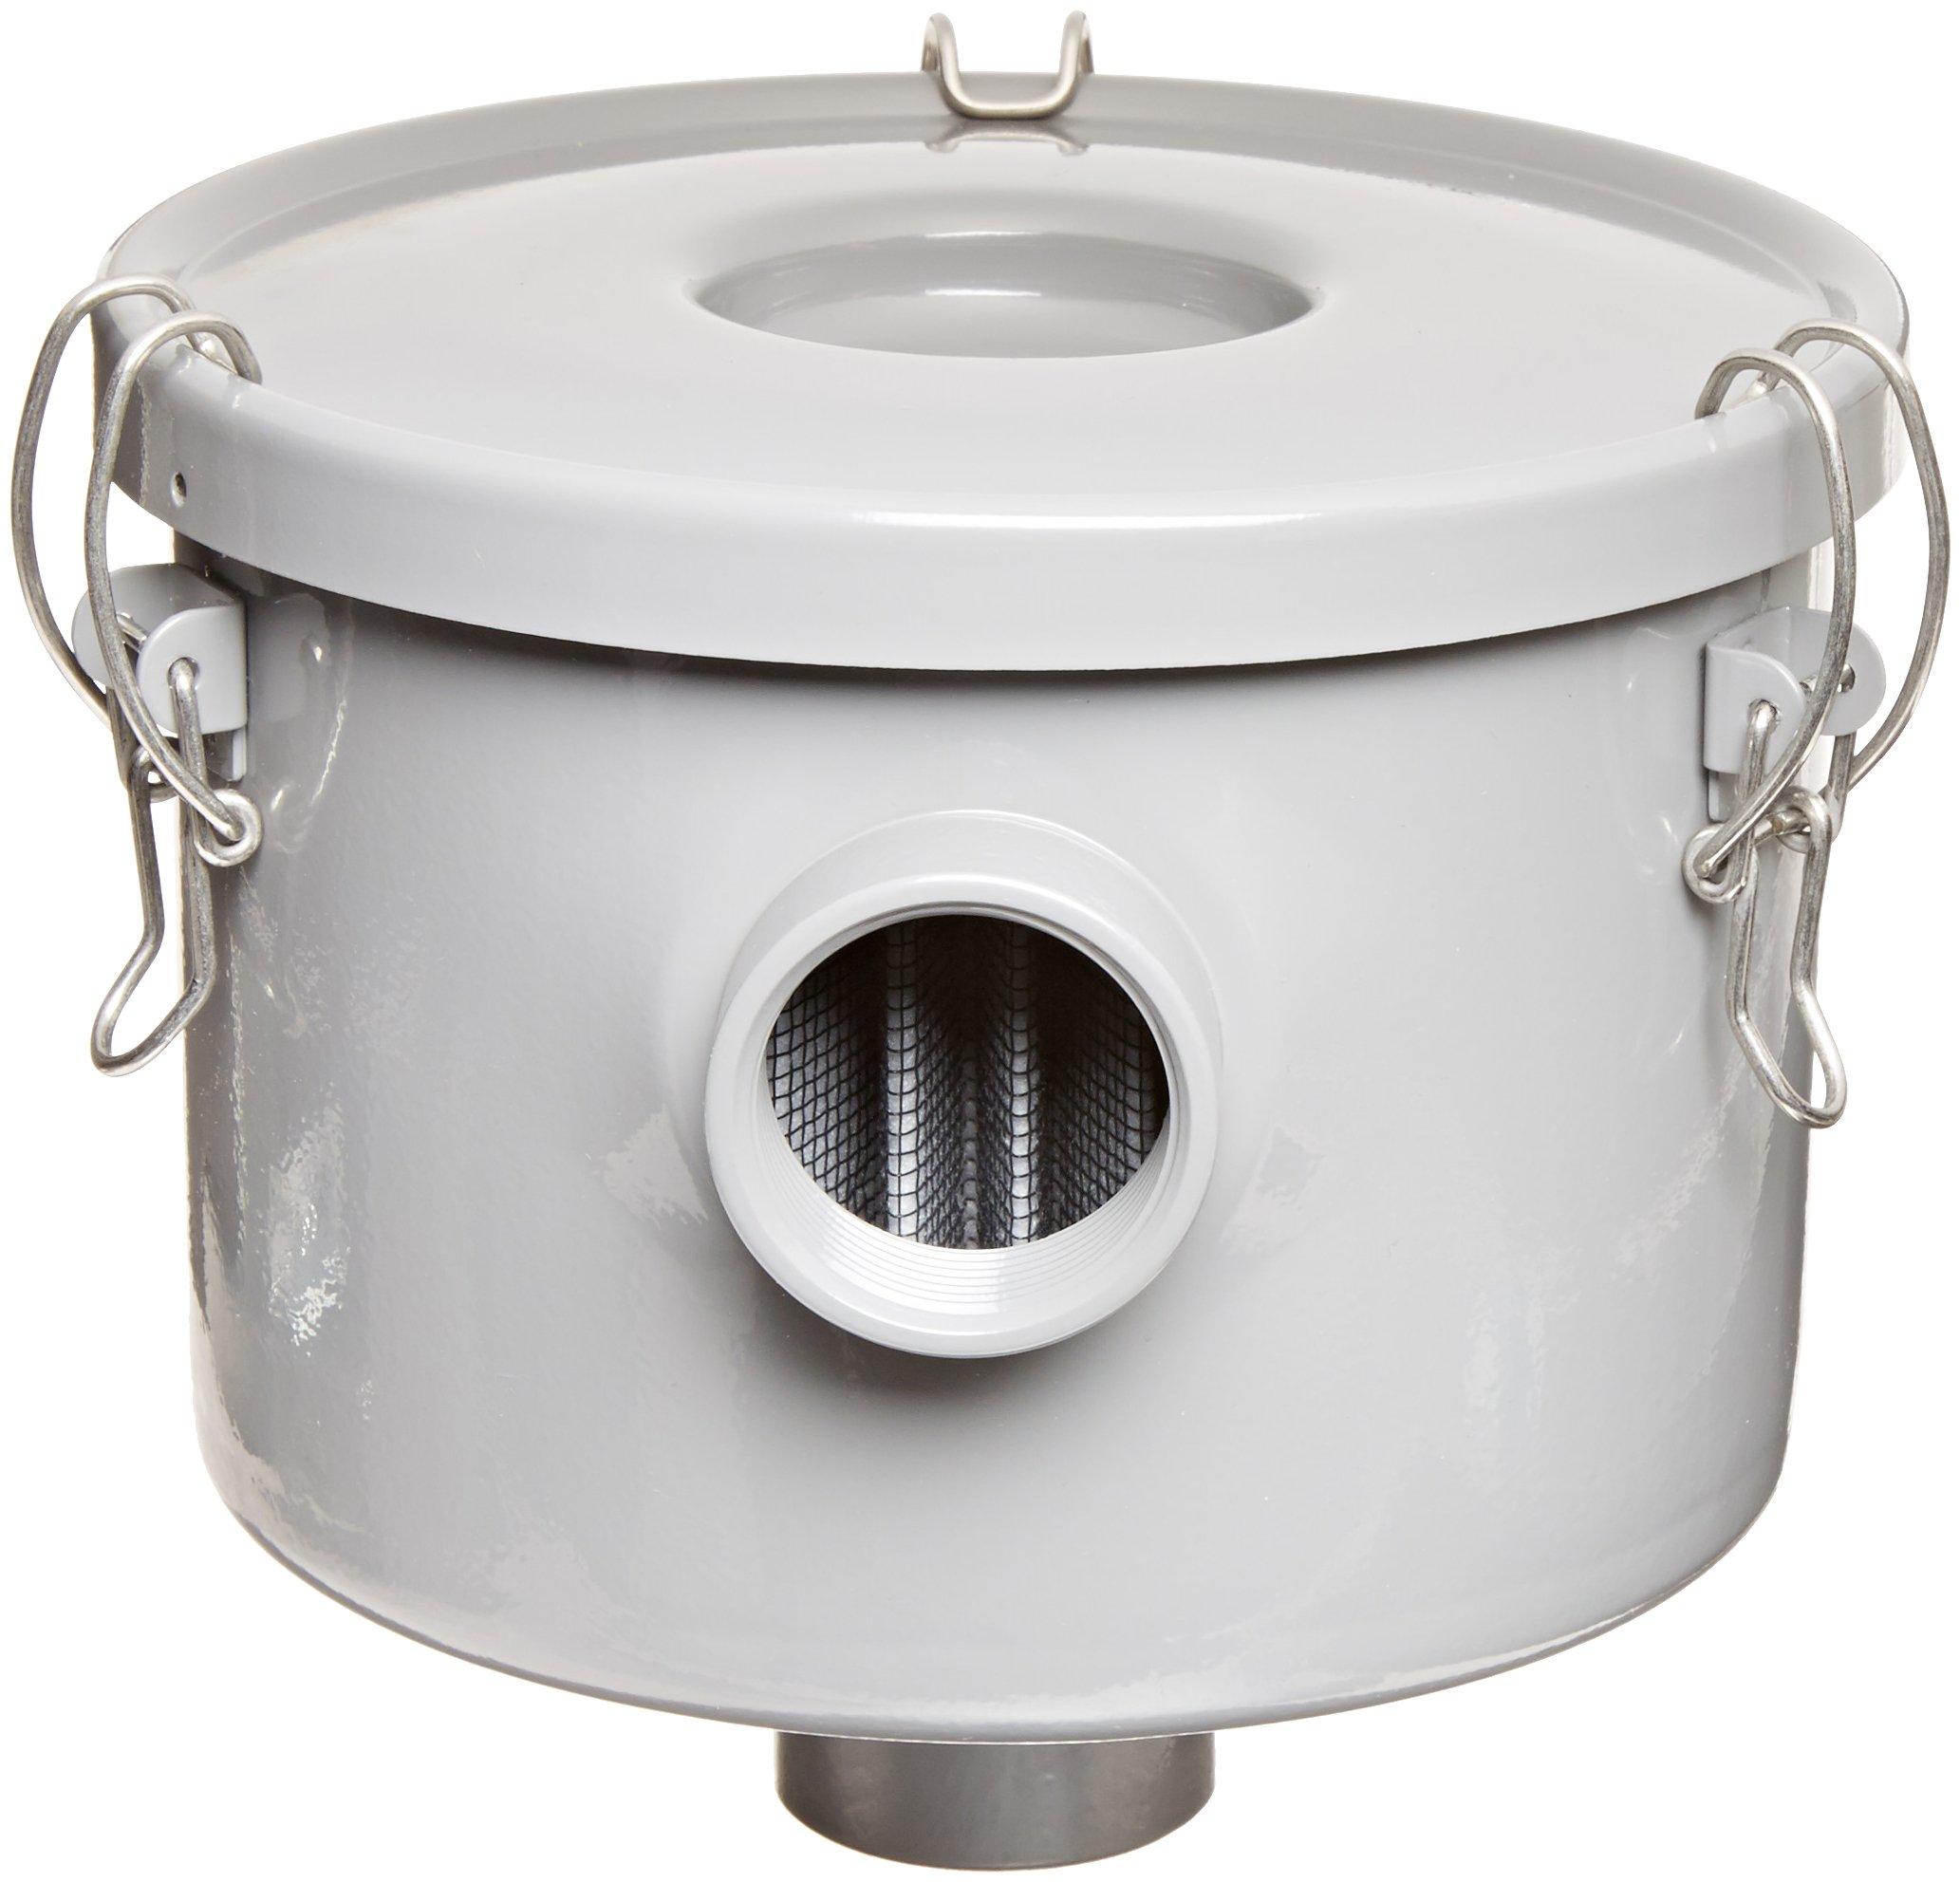 Solberg CSL-849-125HC Inlet Filter, 1-1/4'' FPT Inlet/Outlet, 6-3/4'' Height, 7-5/16'' Diameter, 60 SCFM